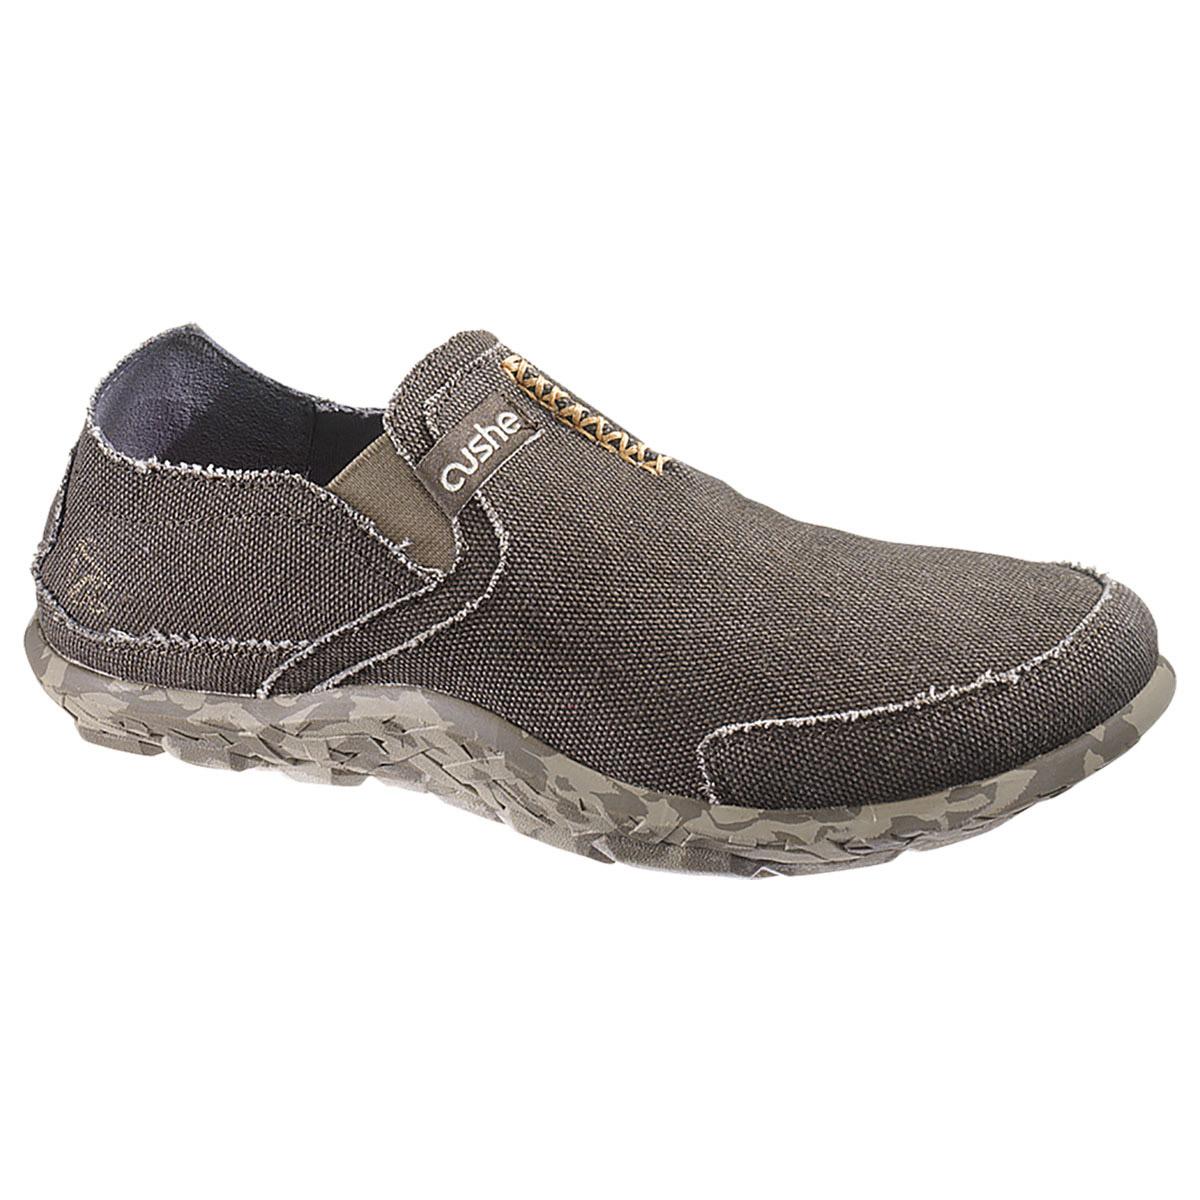 CUSHE Men's Cushe Slipper Shoes, Brown